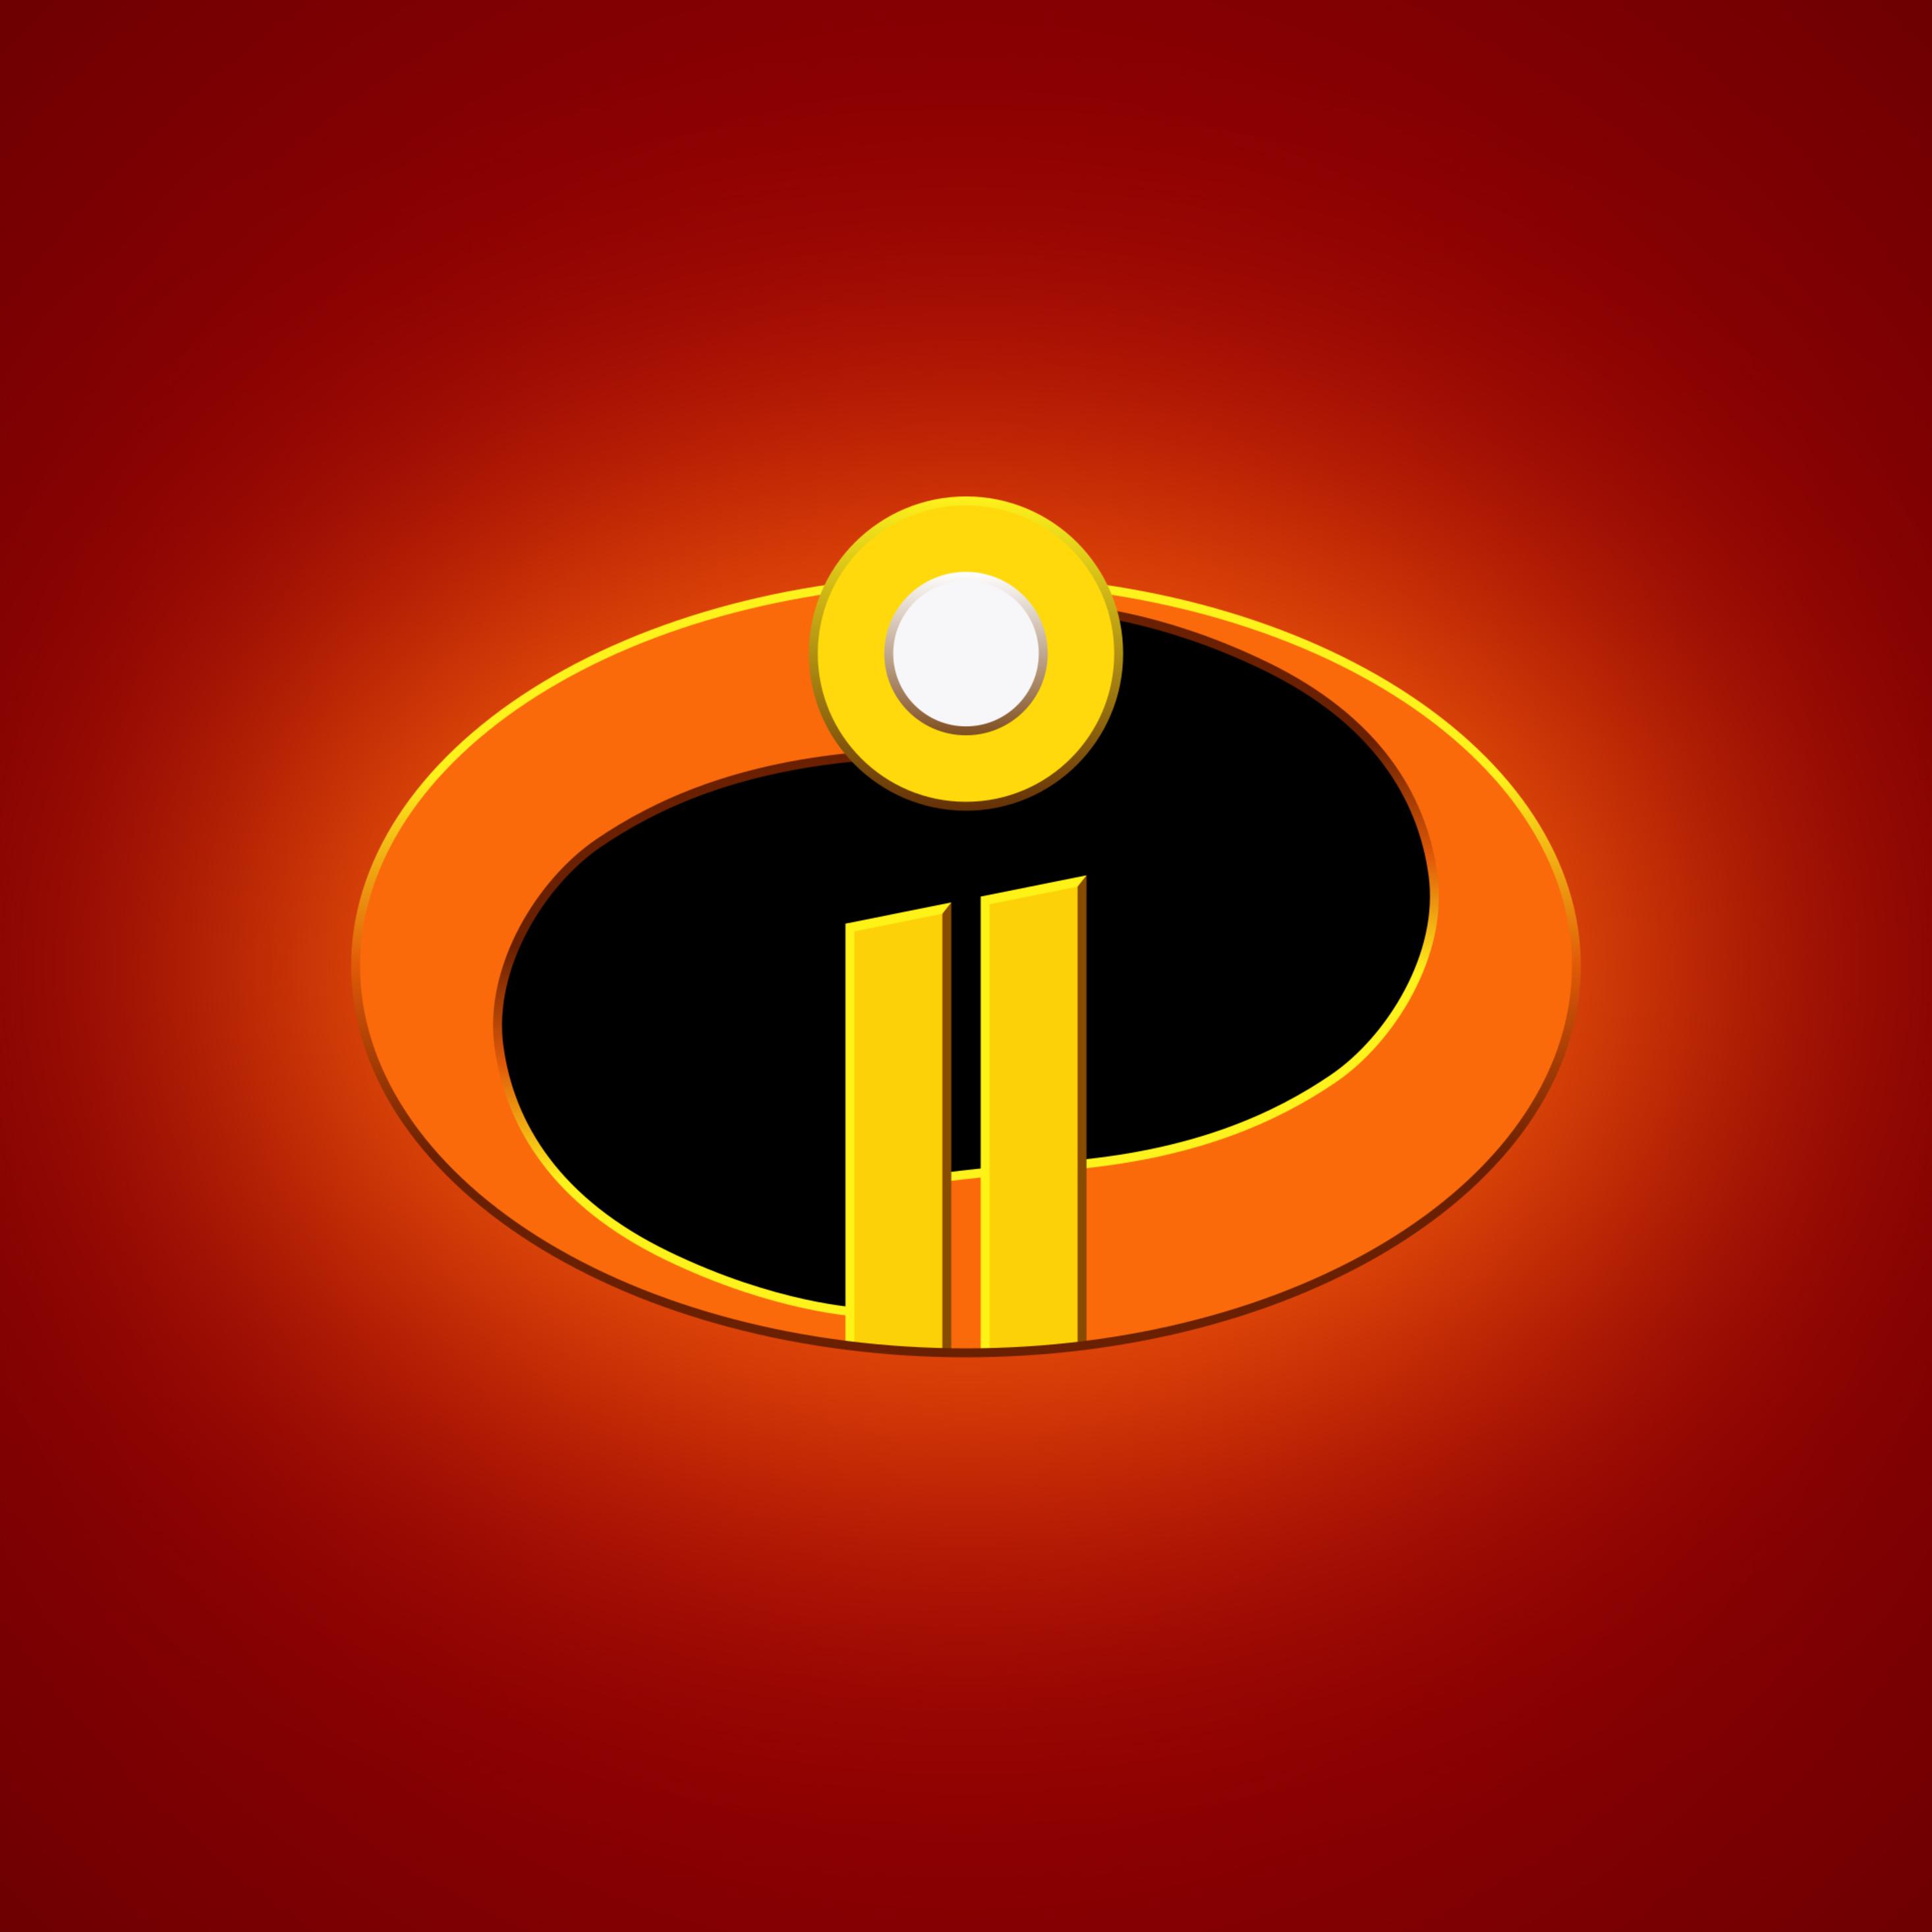 2932x2932 The Incredibles 2 Logo 4k Ipad Pro Retina ...